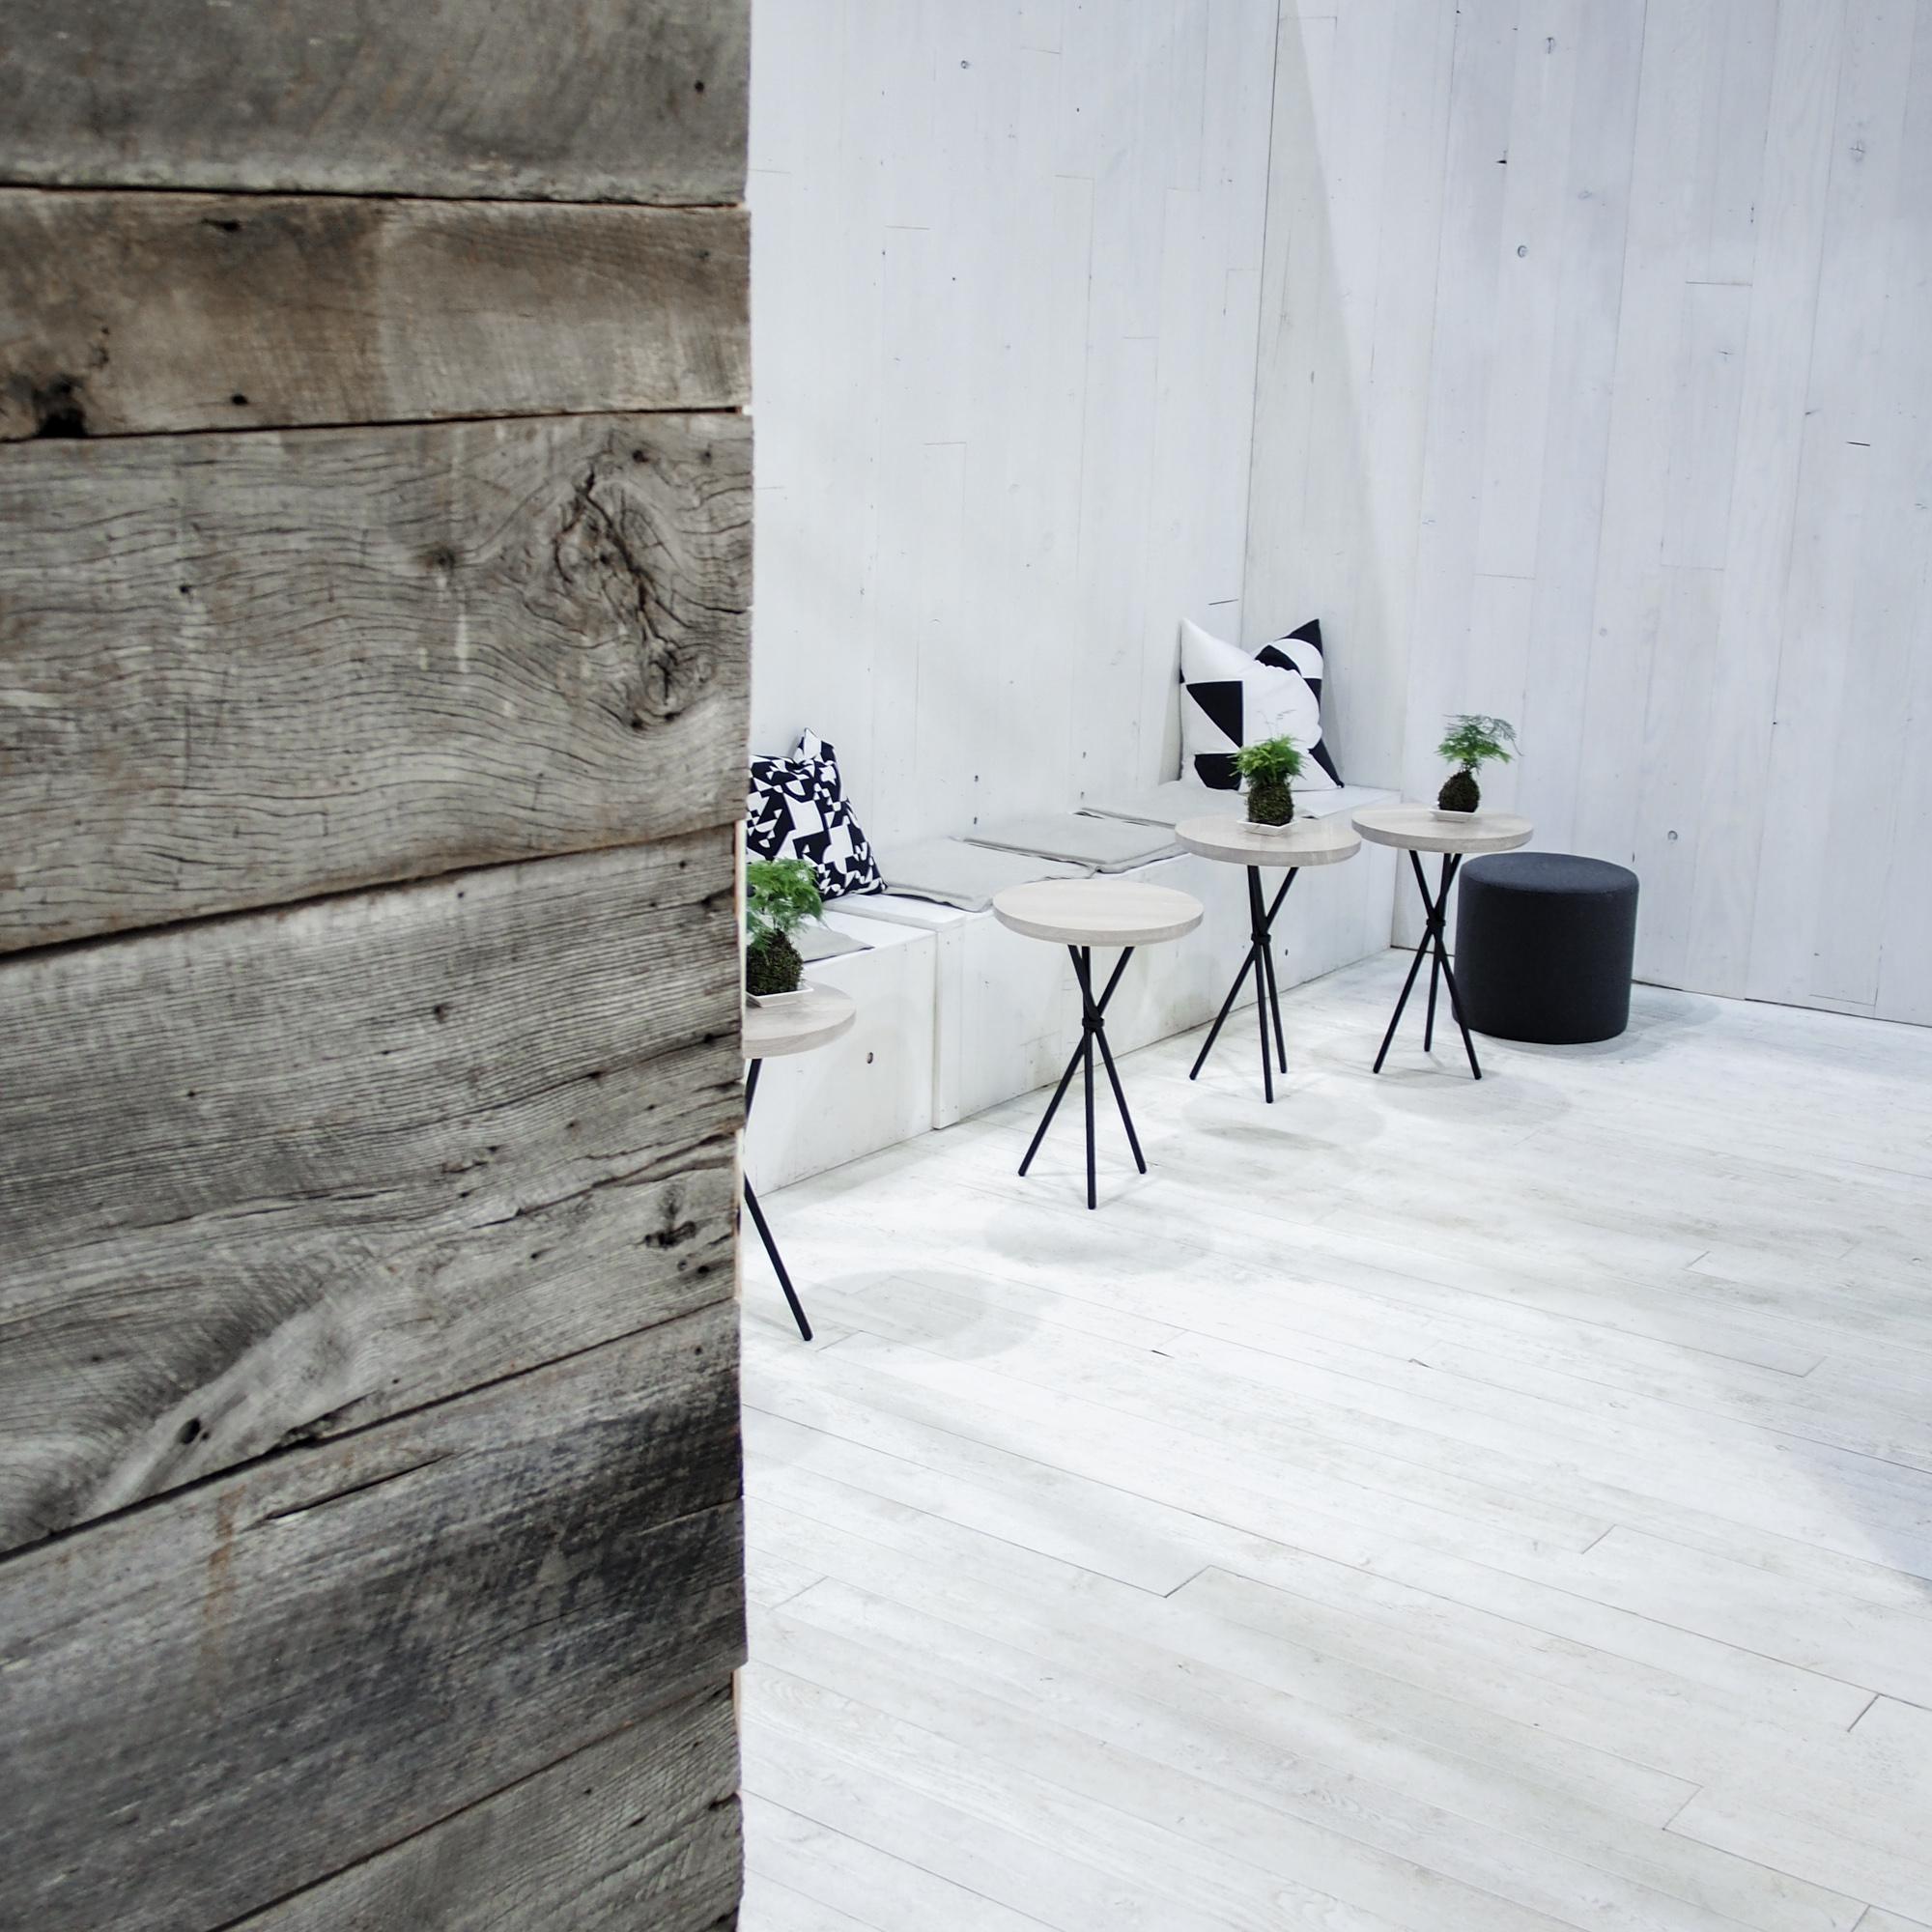 Bottega Vip Lounge-17.jpg